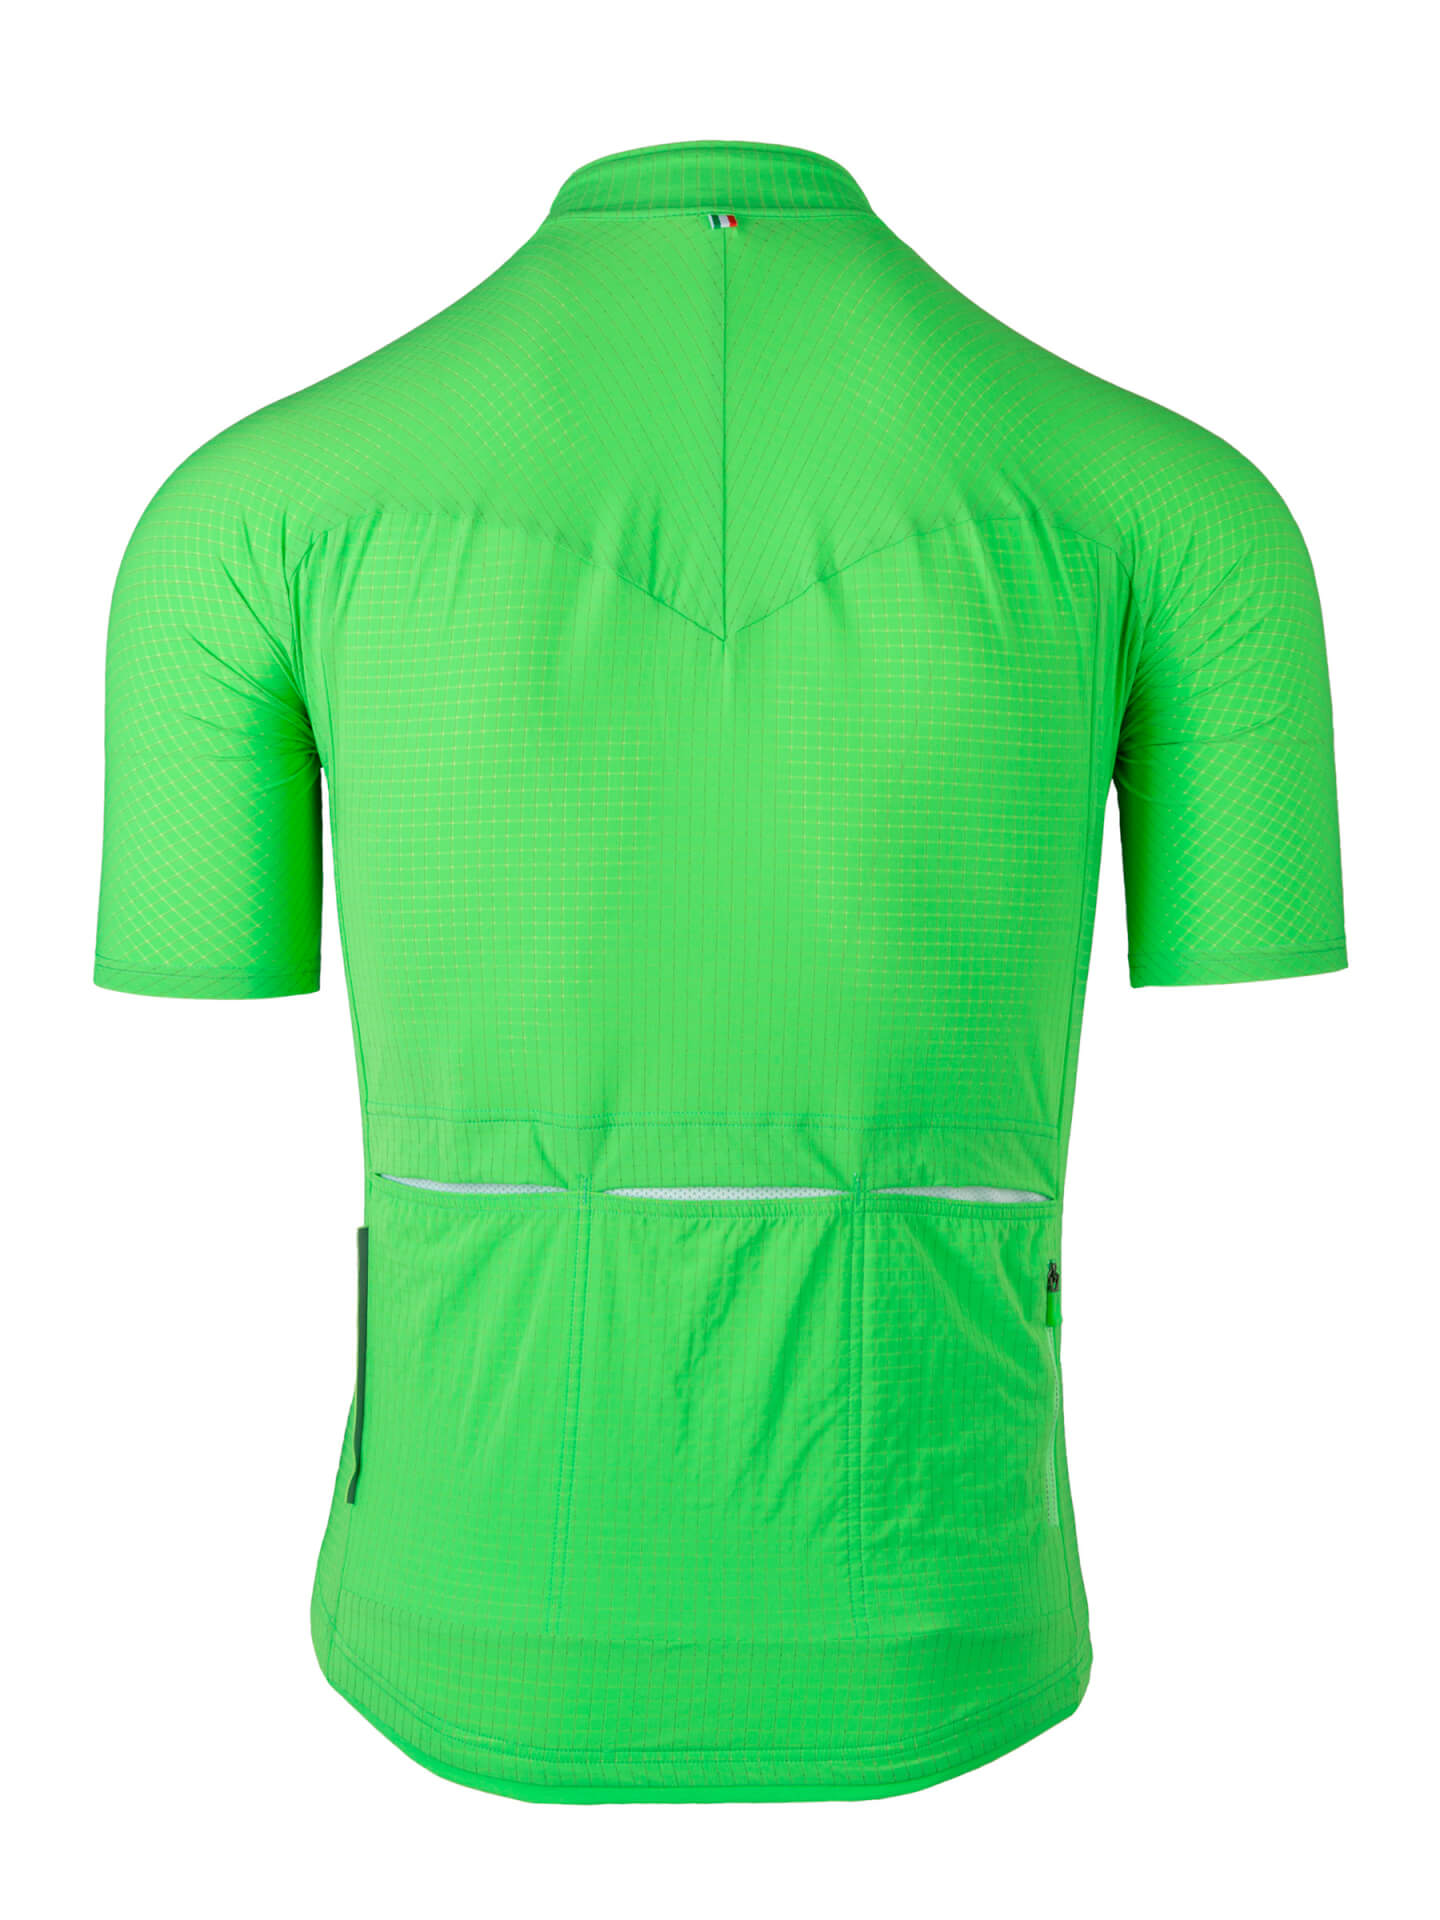 Maillot Manches Courtes L1 Pinstripe Vert